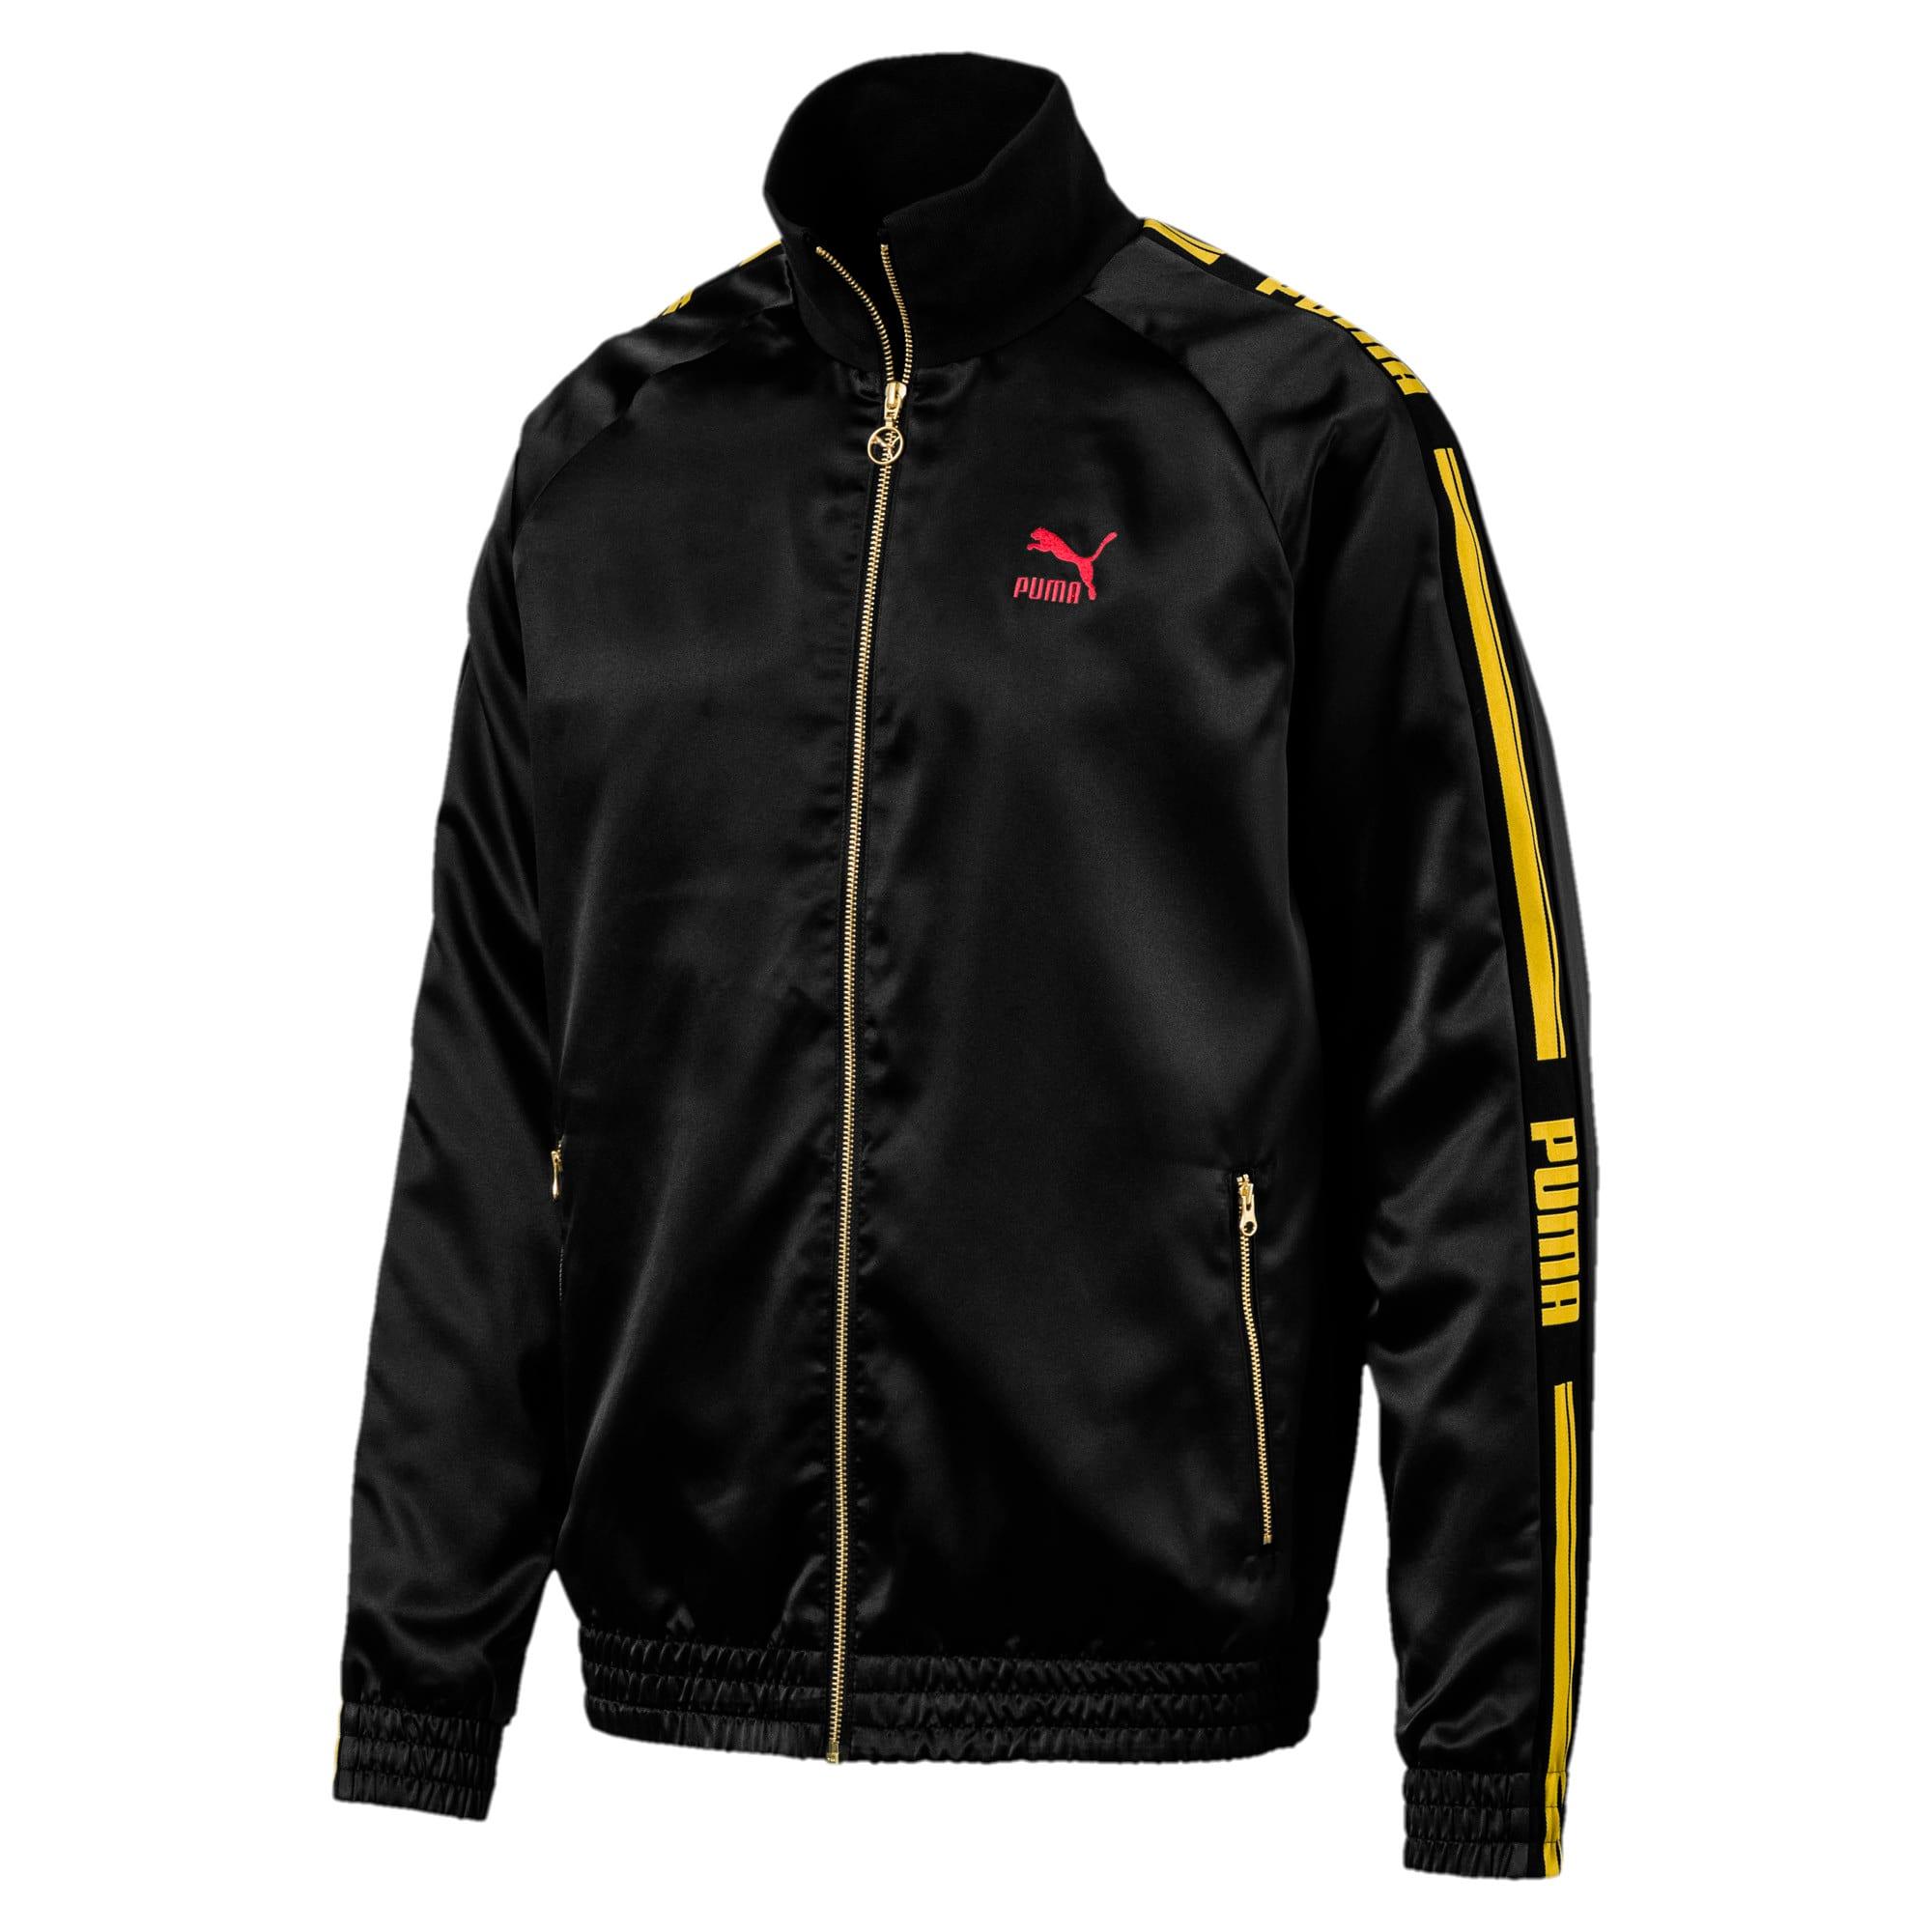 Thumbnail 1 of LUXE PACK Track Jacket, Puma Black, medium